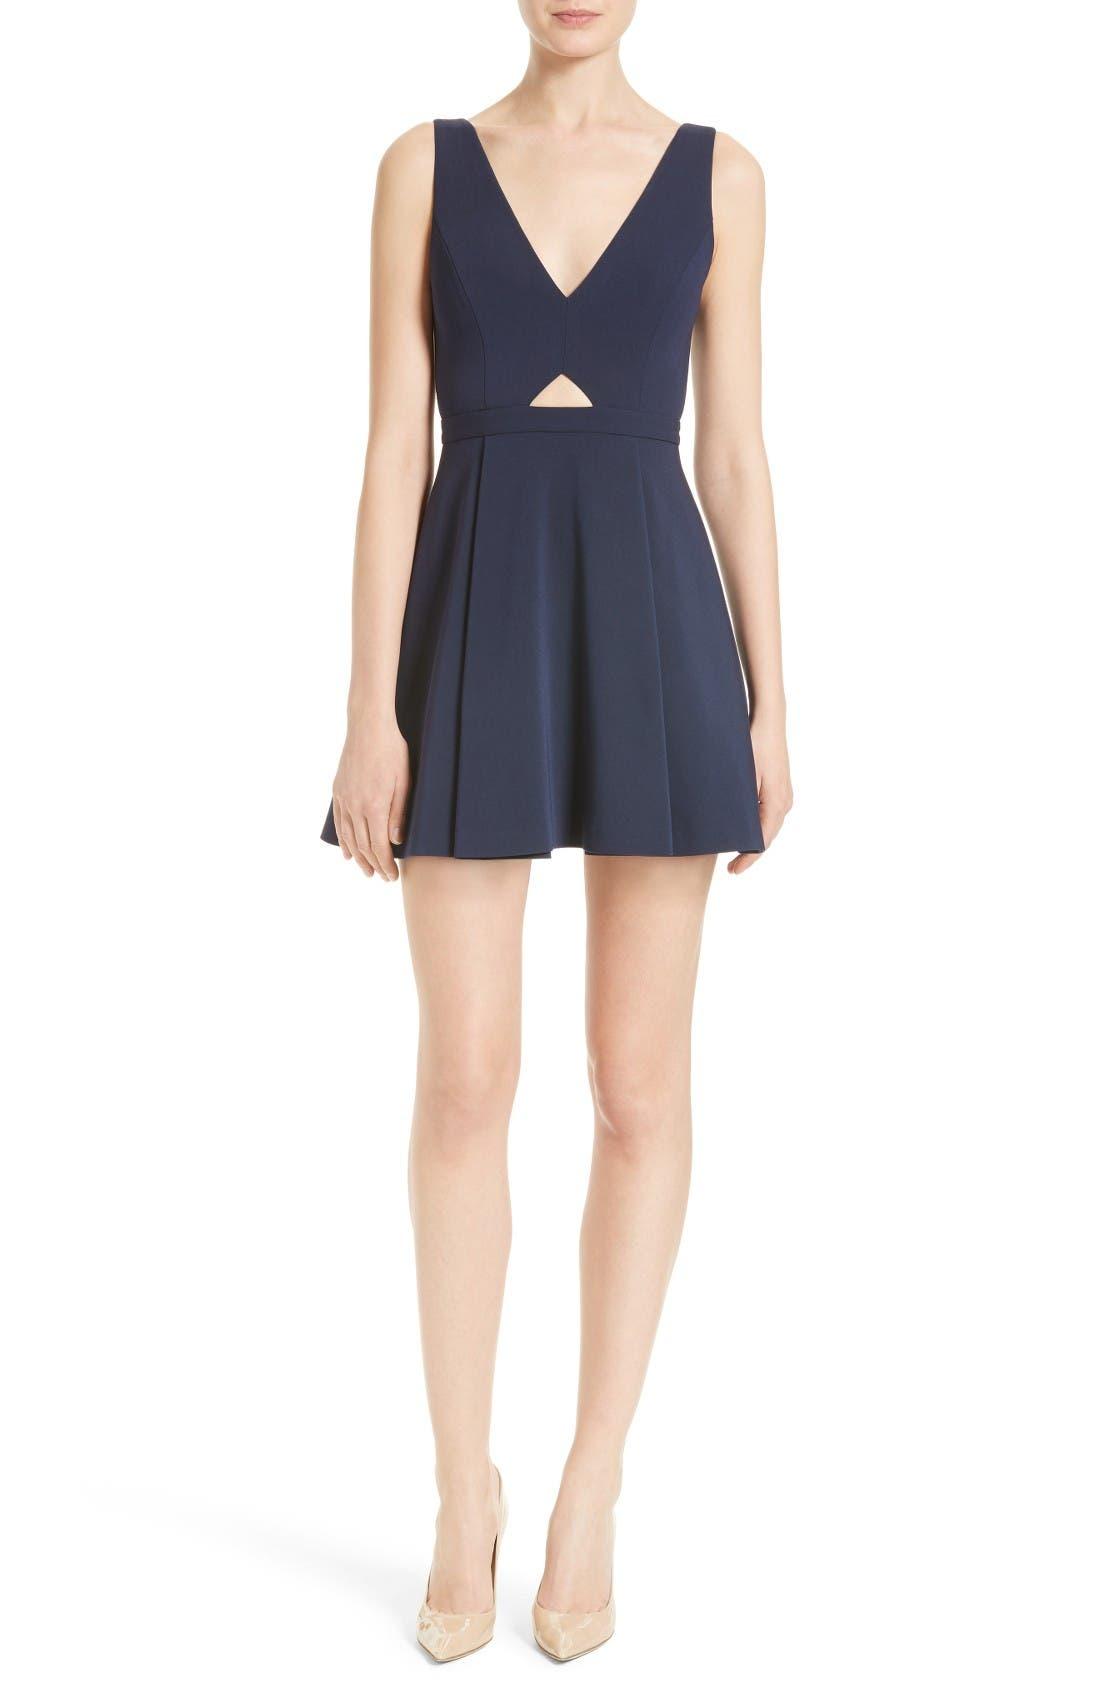 Alice + Olivia Nina Cutout Fit & Flare Dress